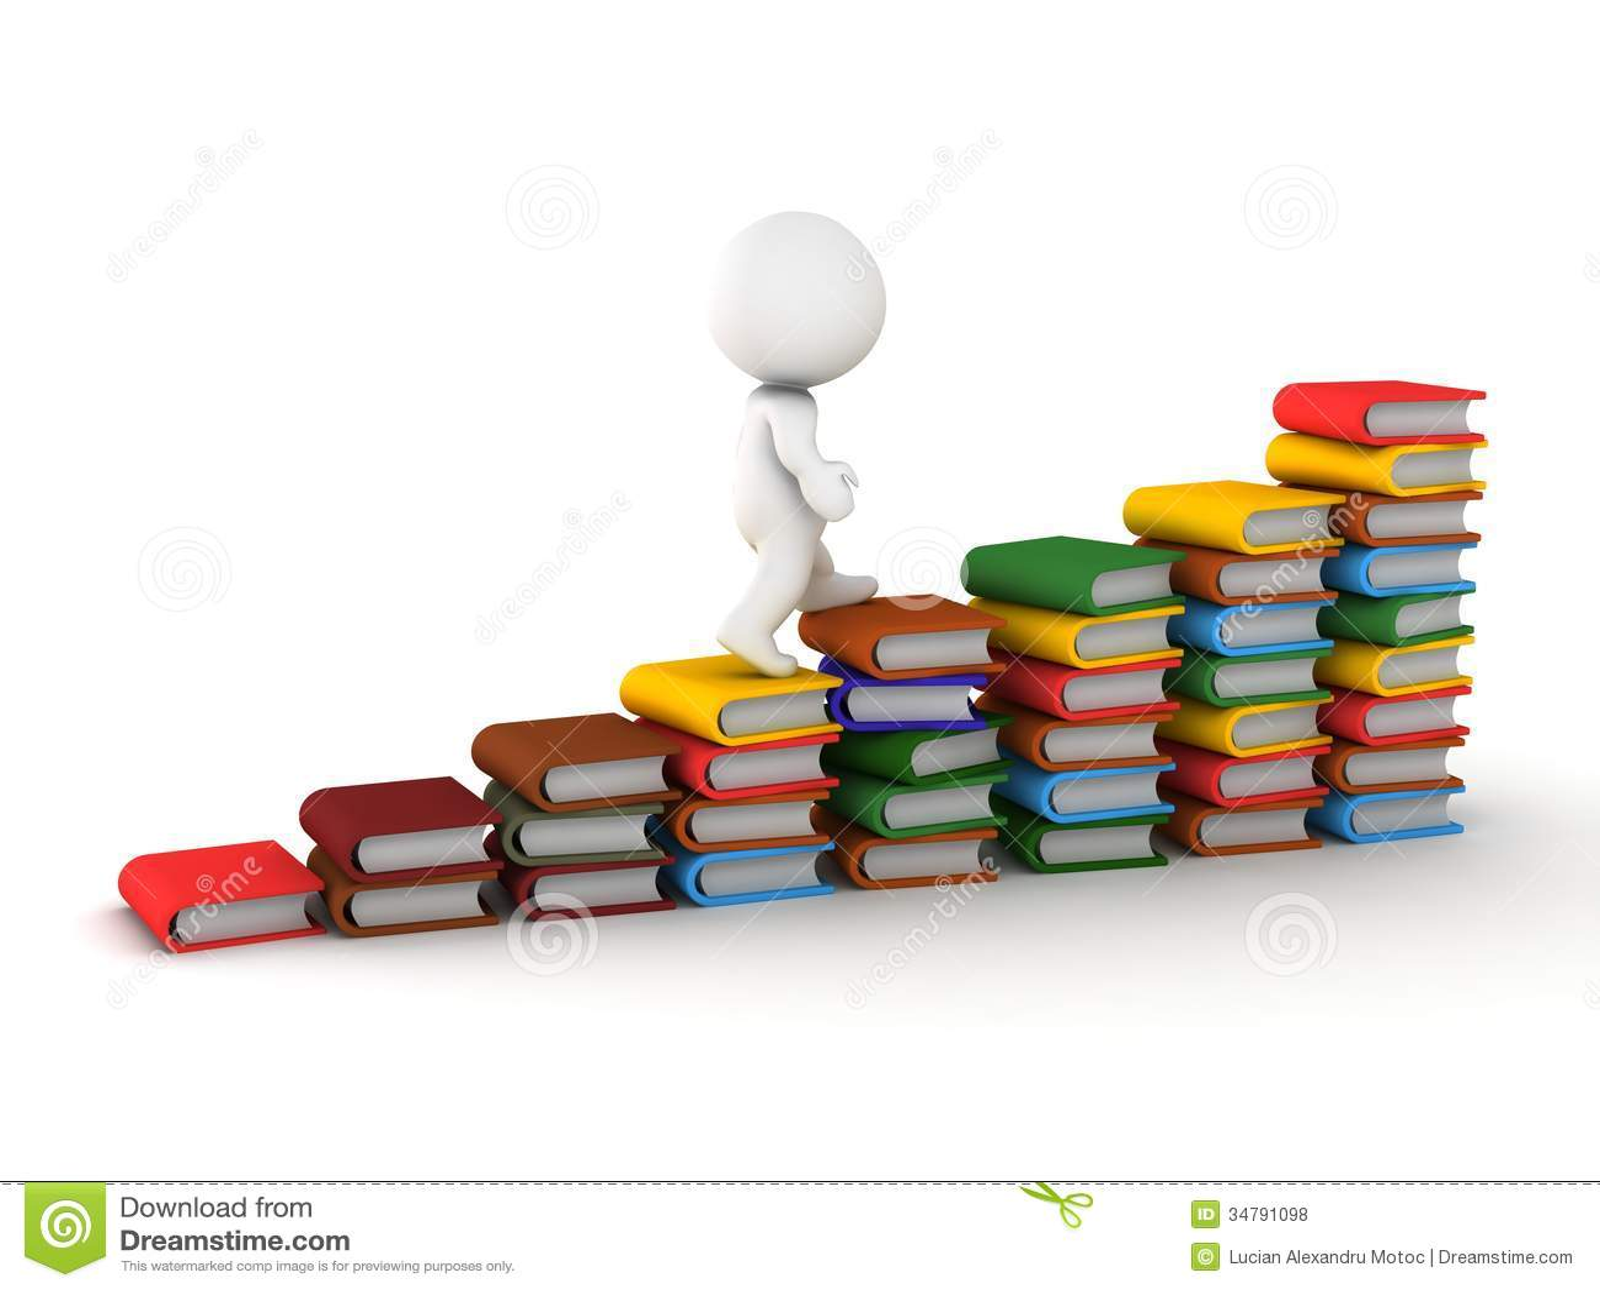 Climbing books stock illustration. Illustration of study - 27514279 for Student Climbing Ladder  186ref